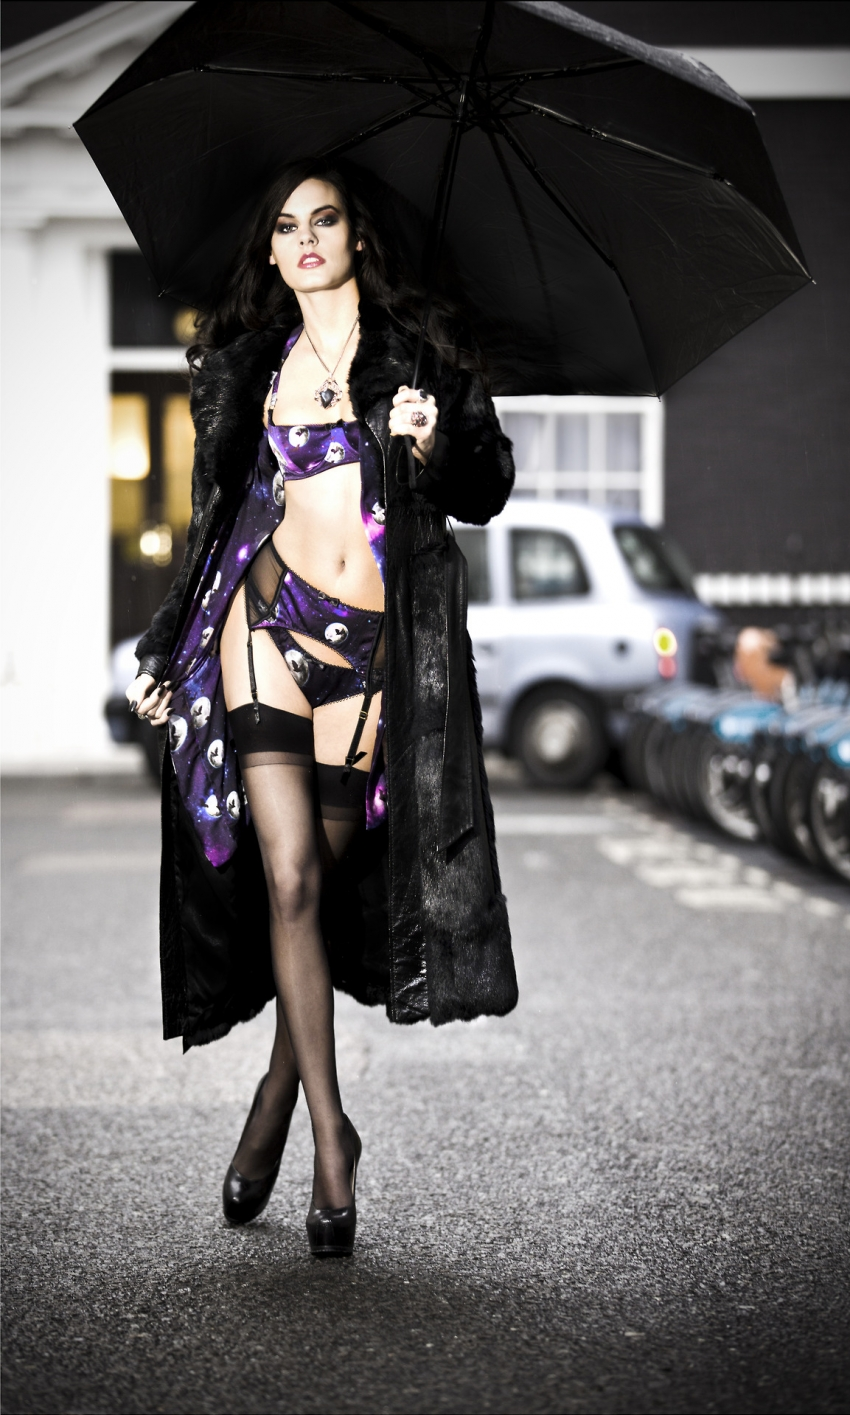 sexy woman lingerie overcoat